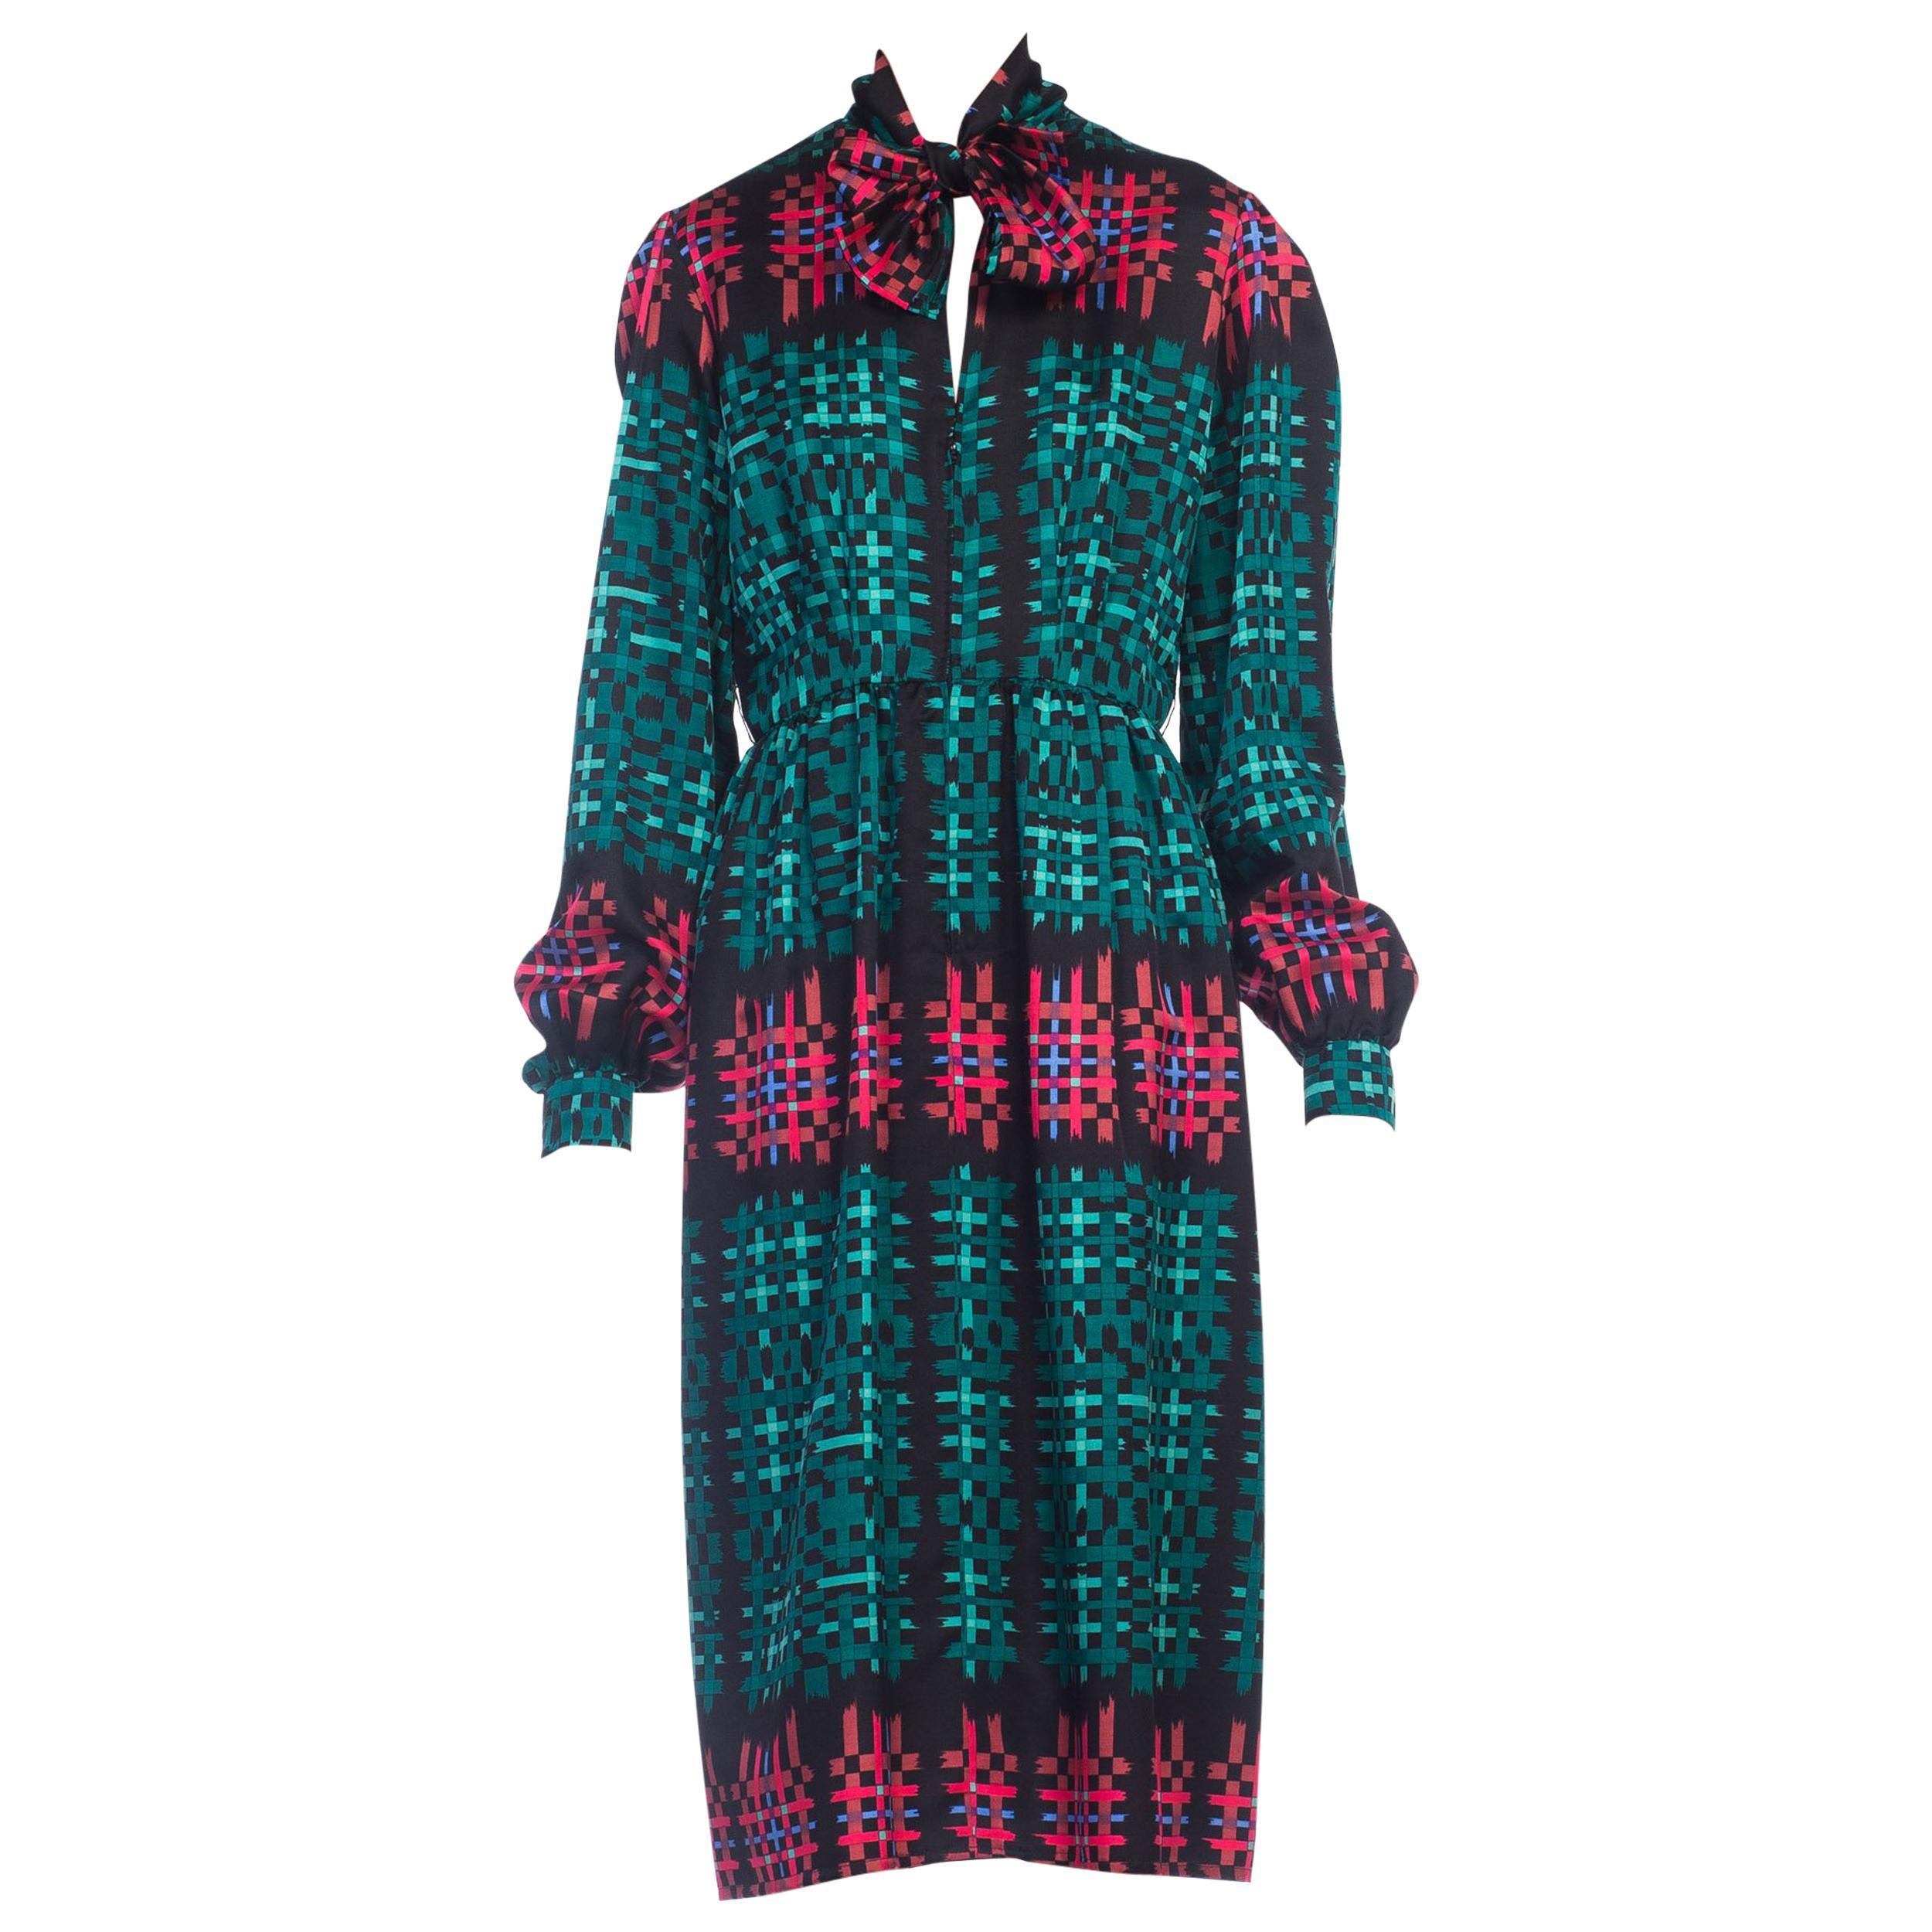 d0f04b0fc 1970s Richilene Gucci Style Plaid Dress For Sale at 1stdibs